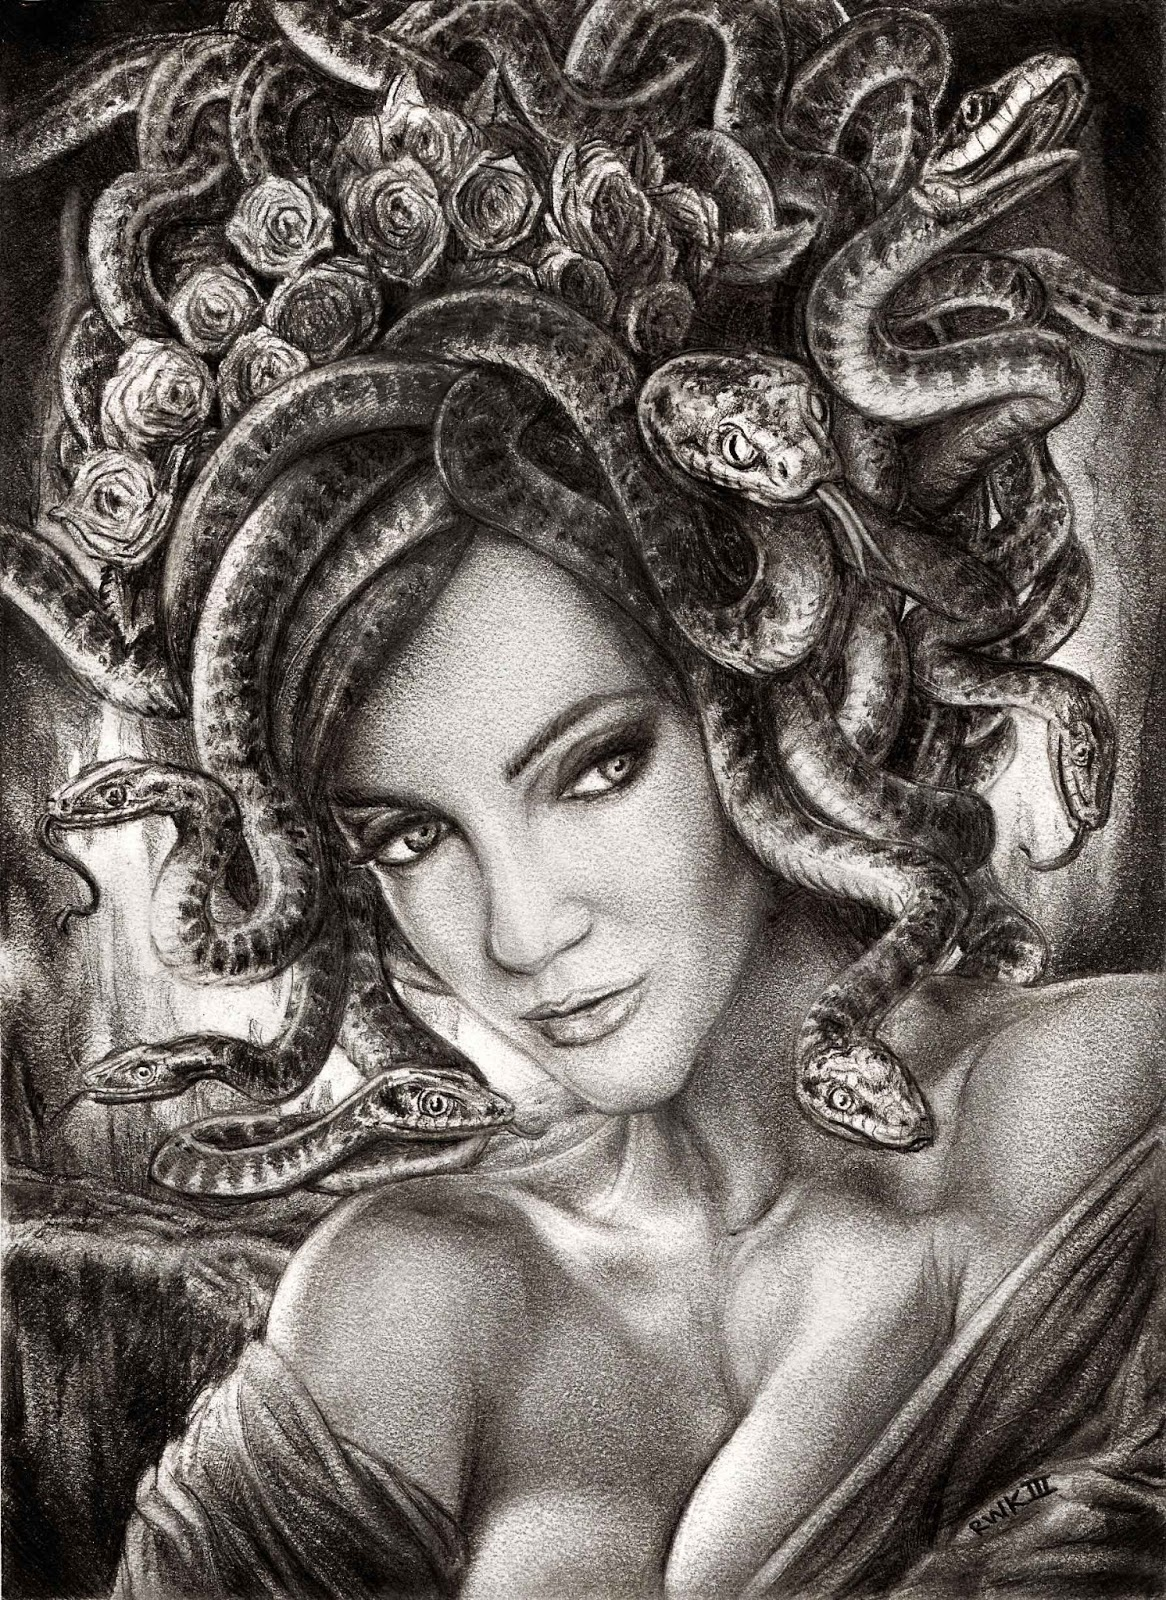 Story of Medusa and Athena